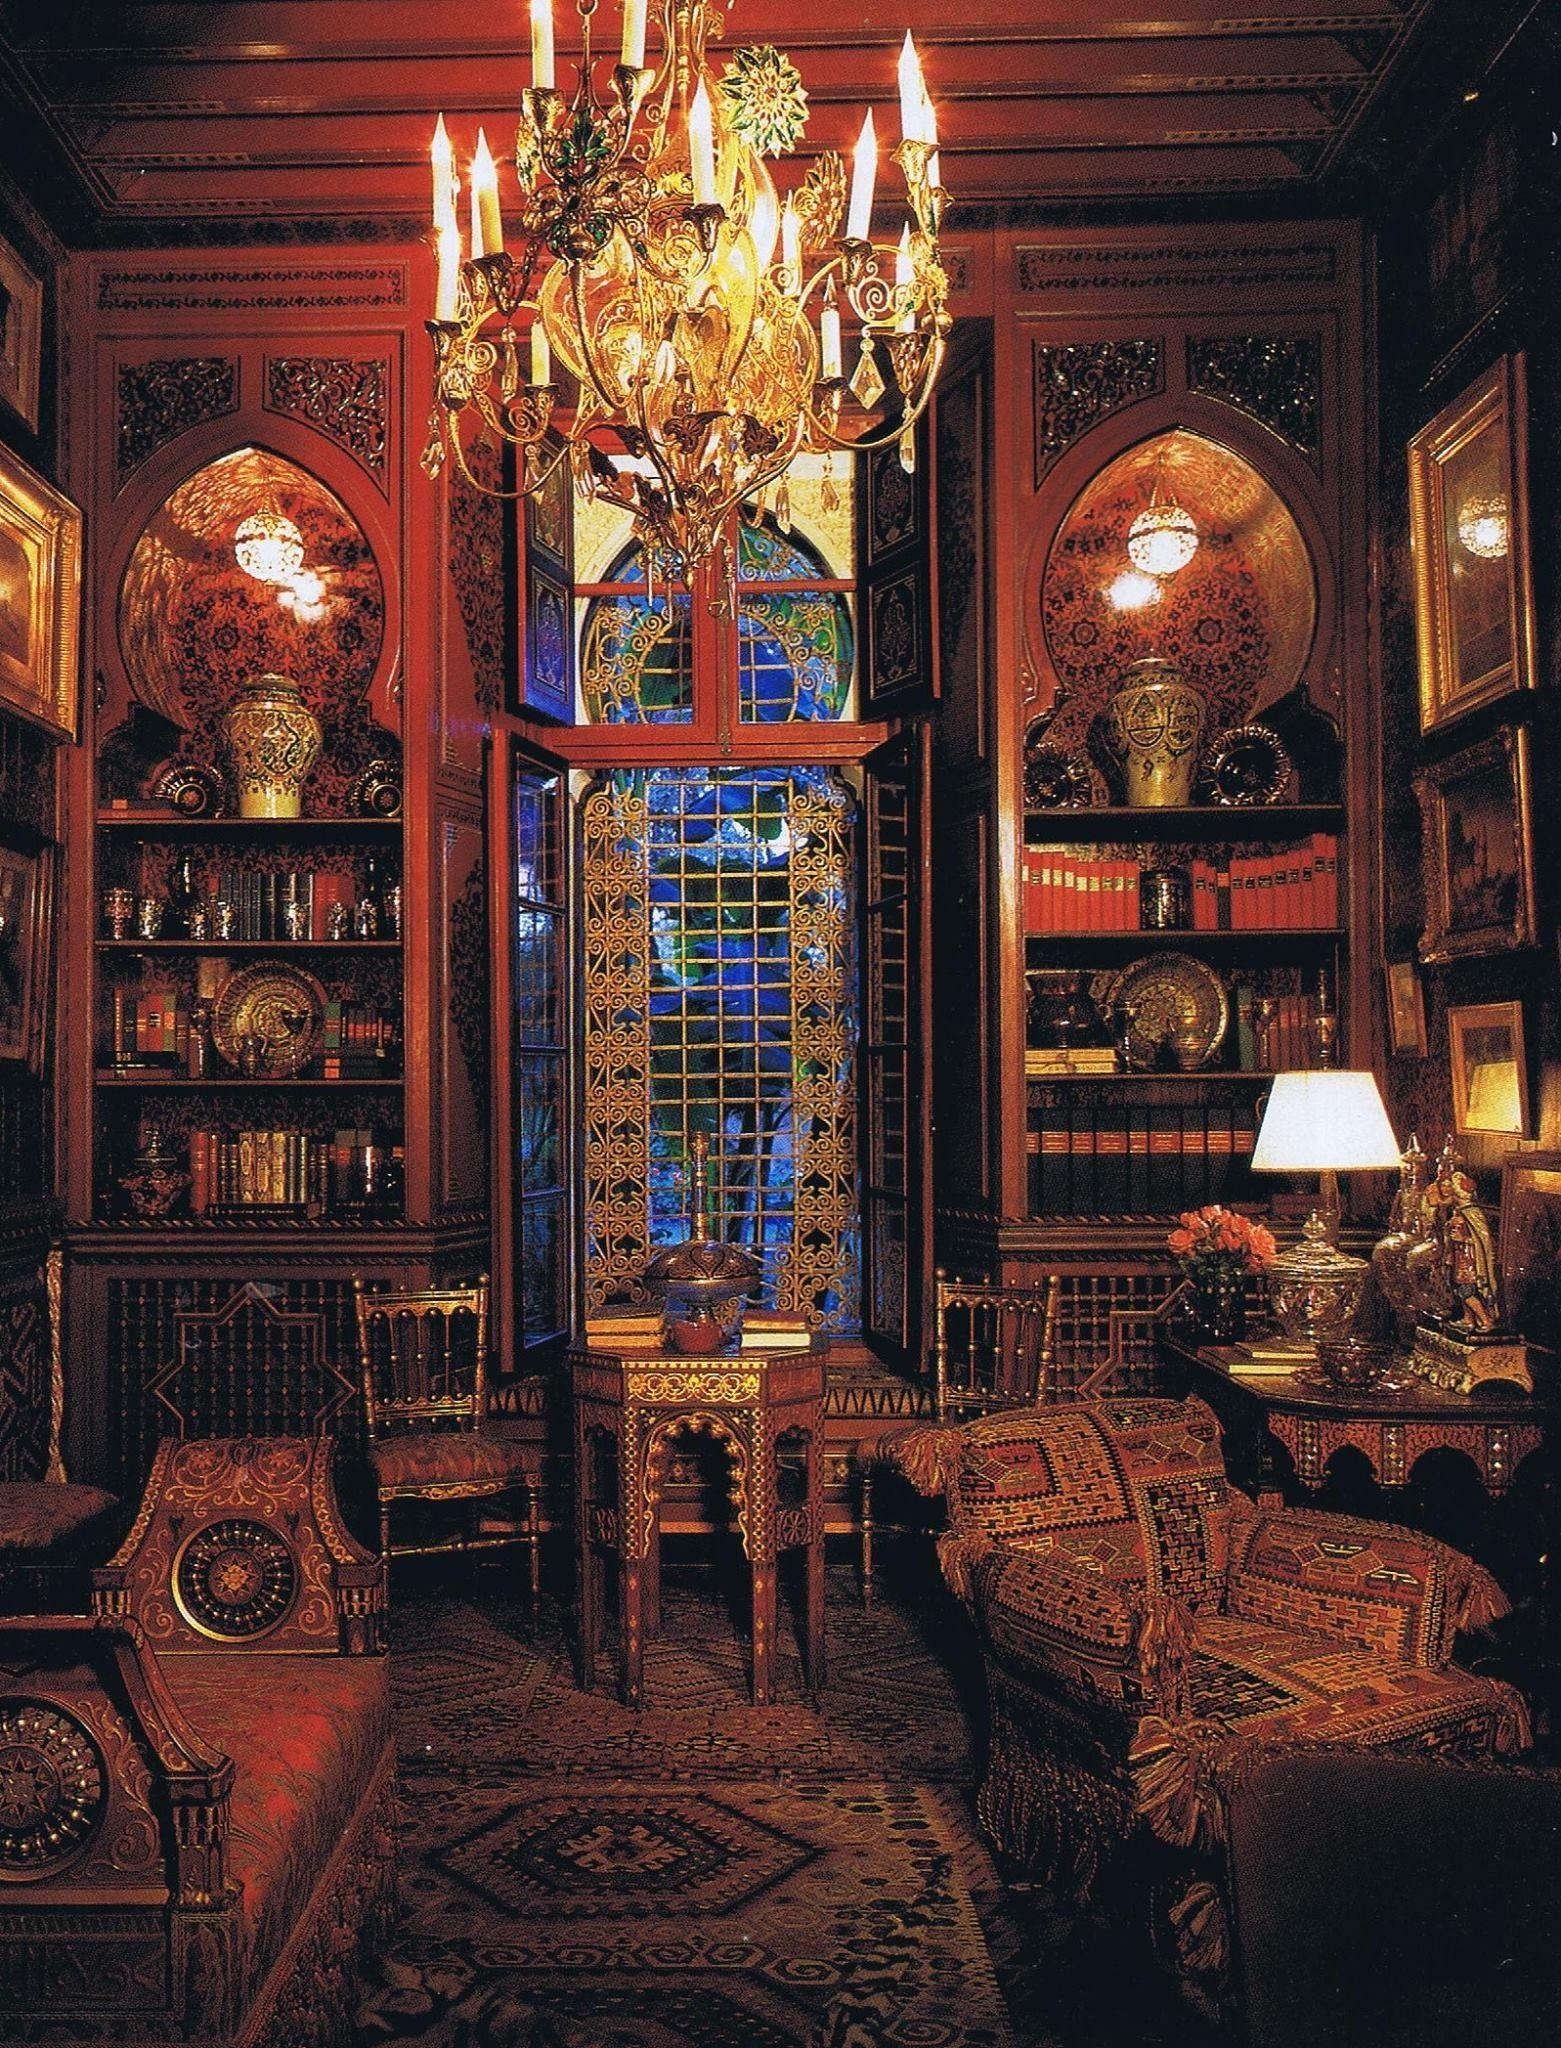 Yves Saint Laurent´s home - Marrakech